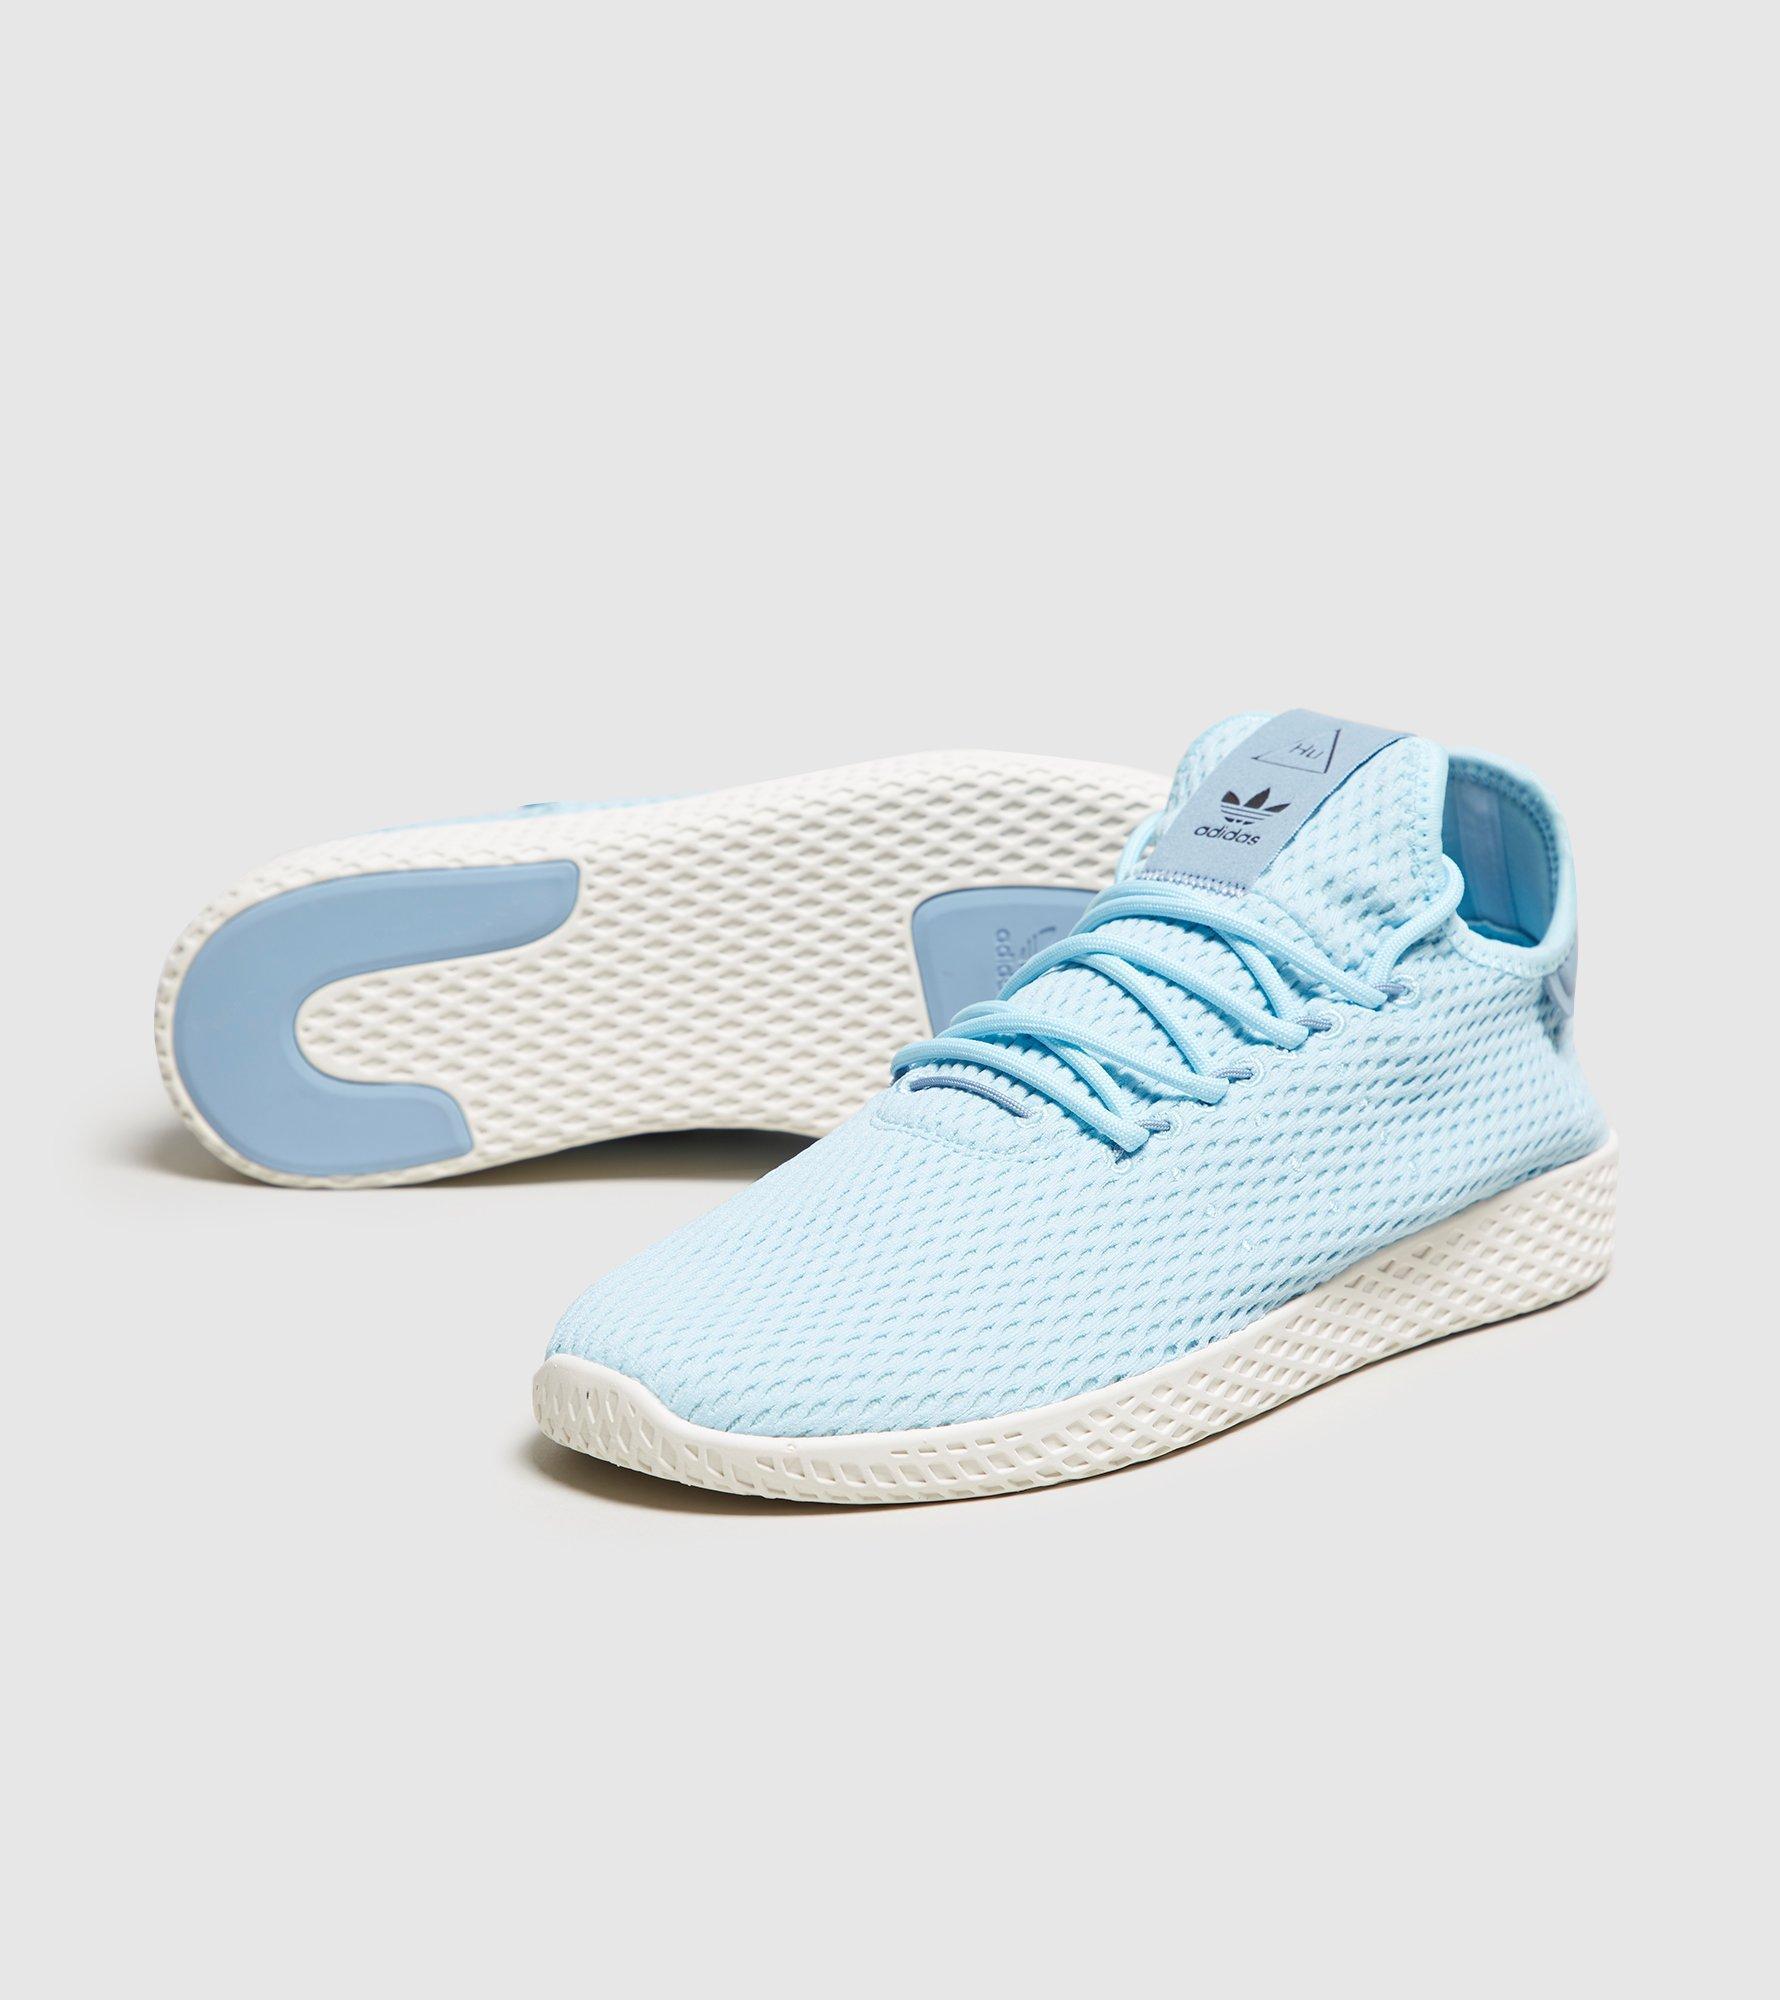 81e47d5573dfb Adidas Originals Pharrell Williams Tennis Hu in Blue for Men - Lyst